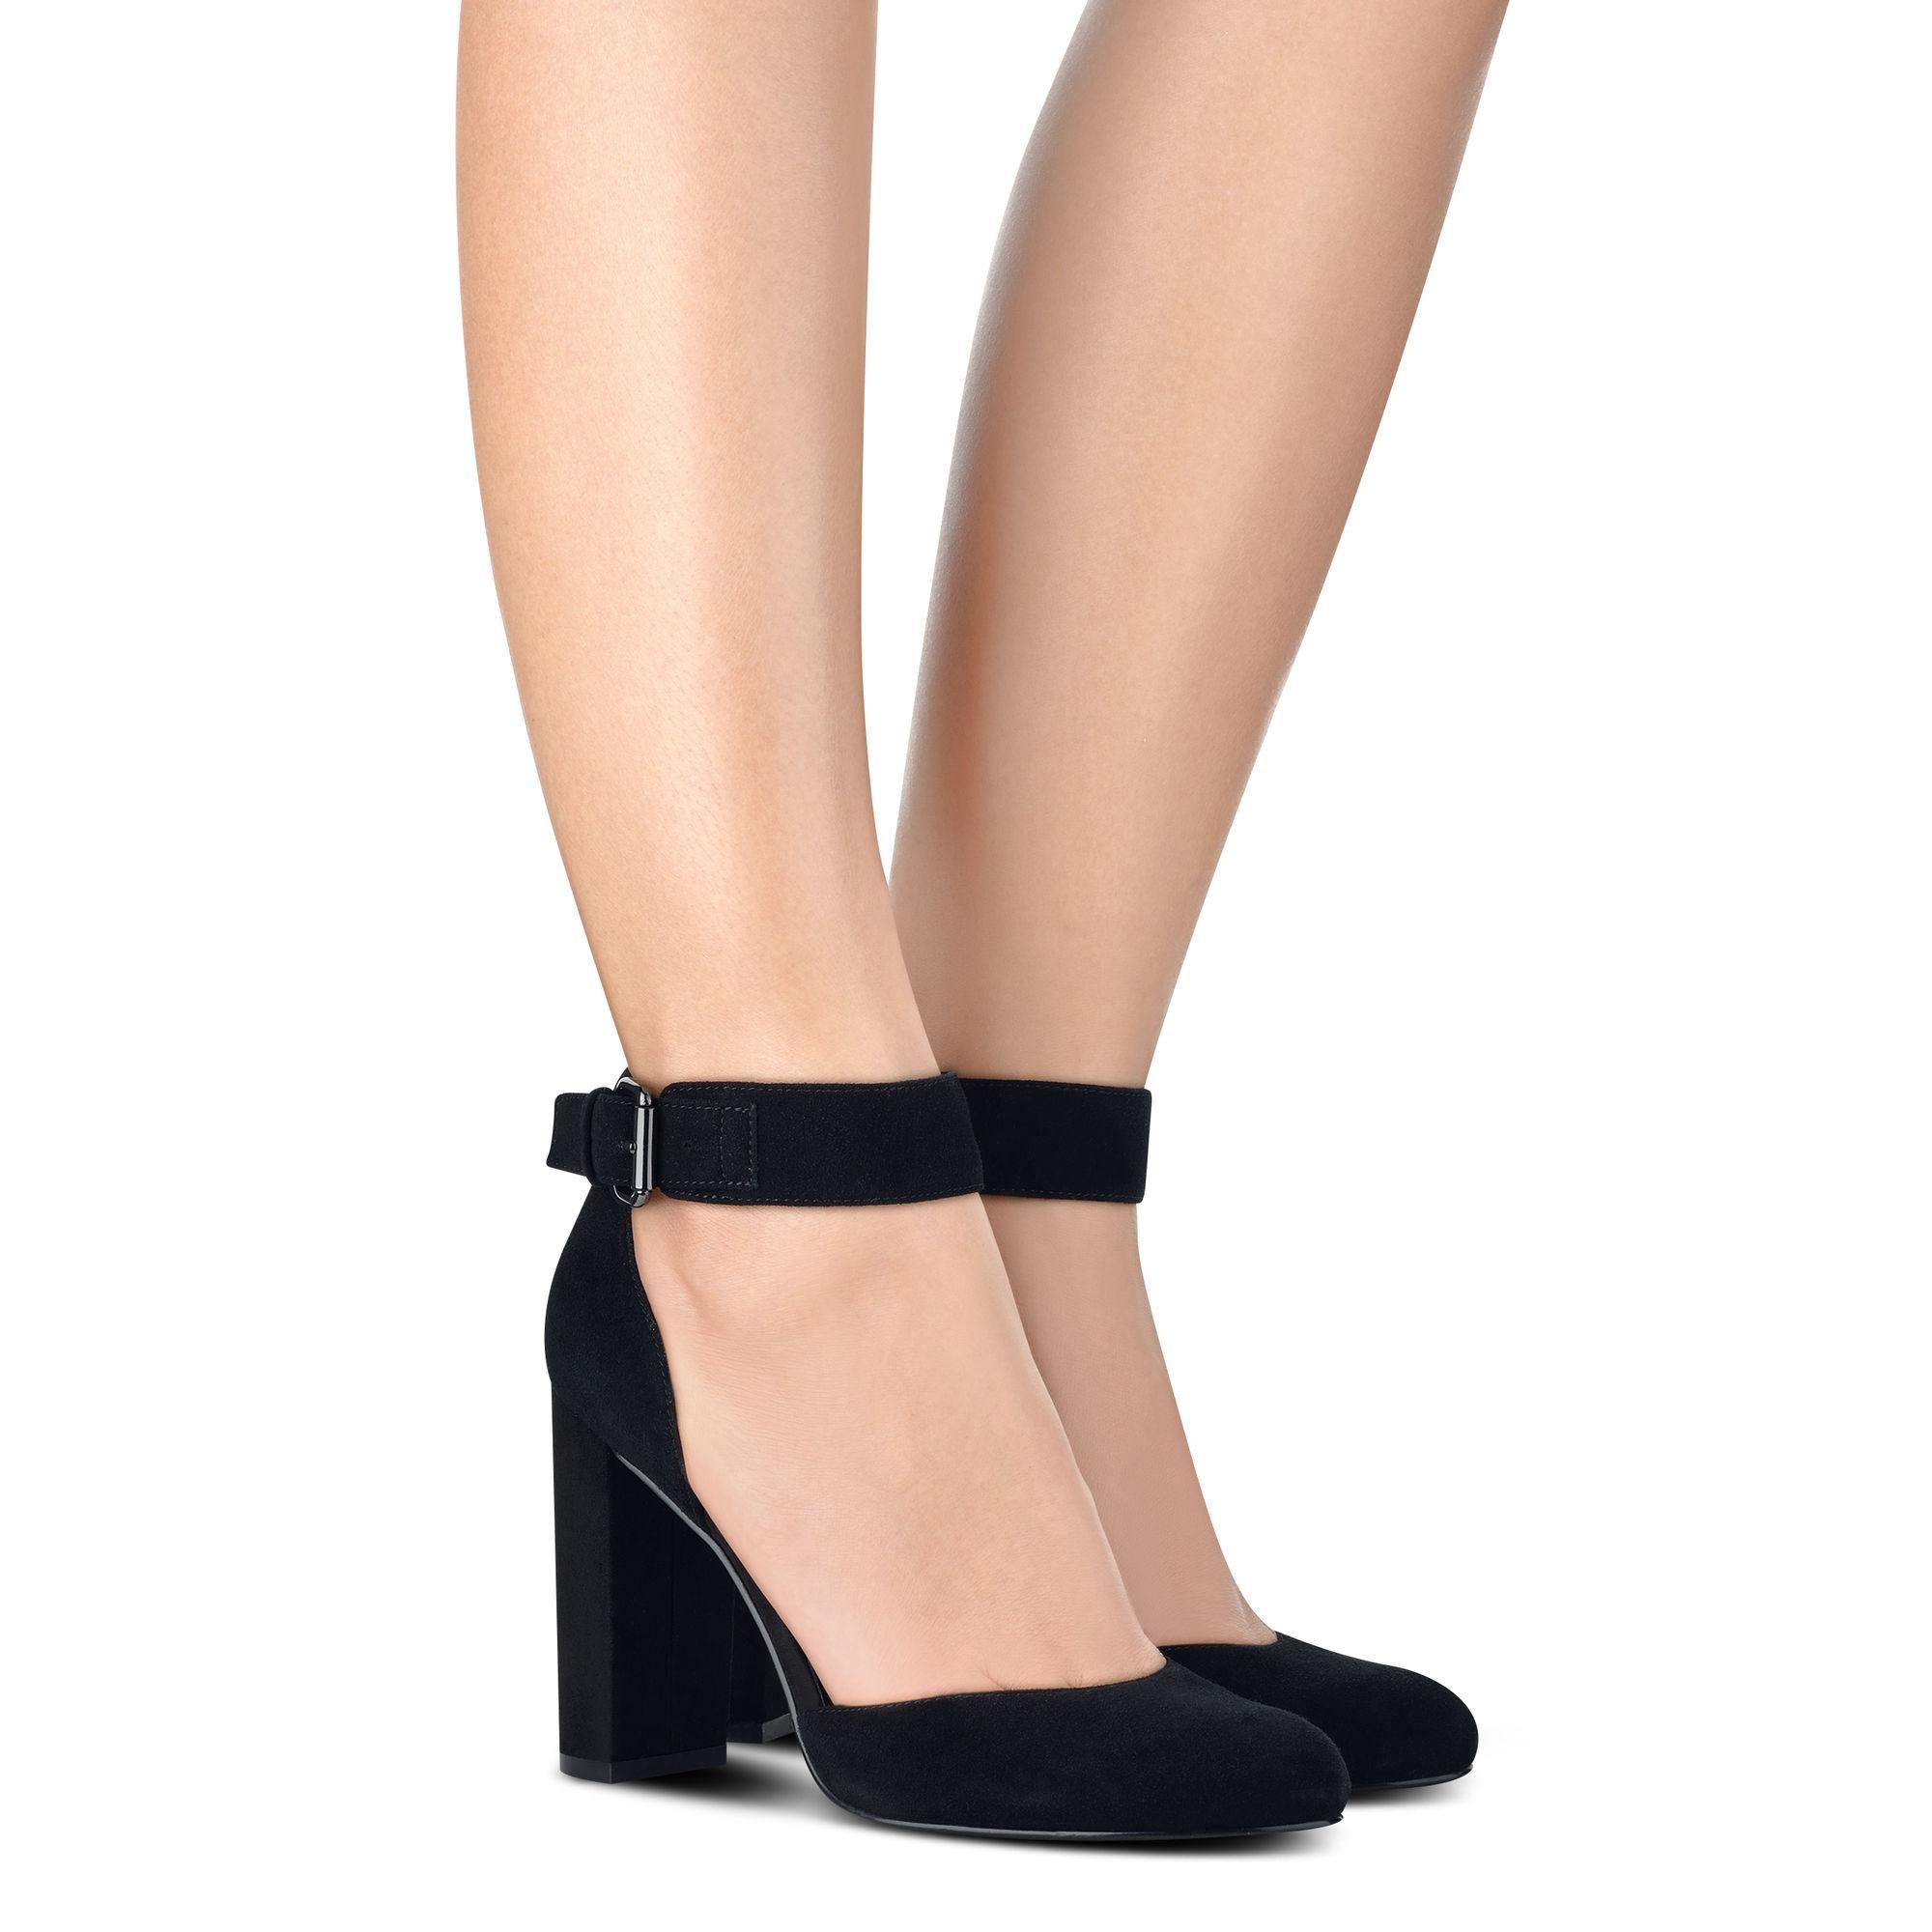 Lyst Nine West Lynnora Ankle Strap Pumps In Black